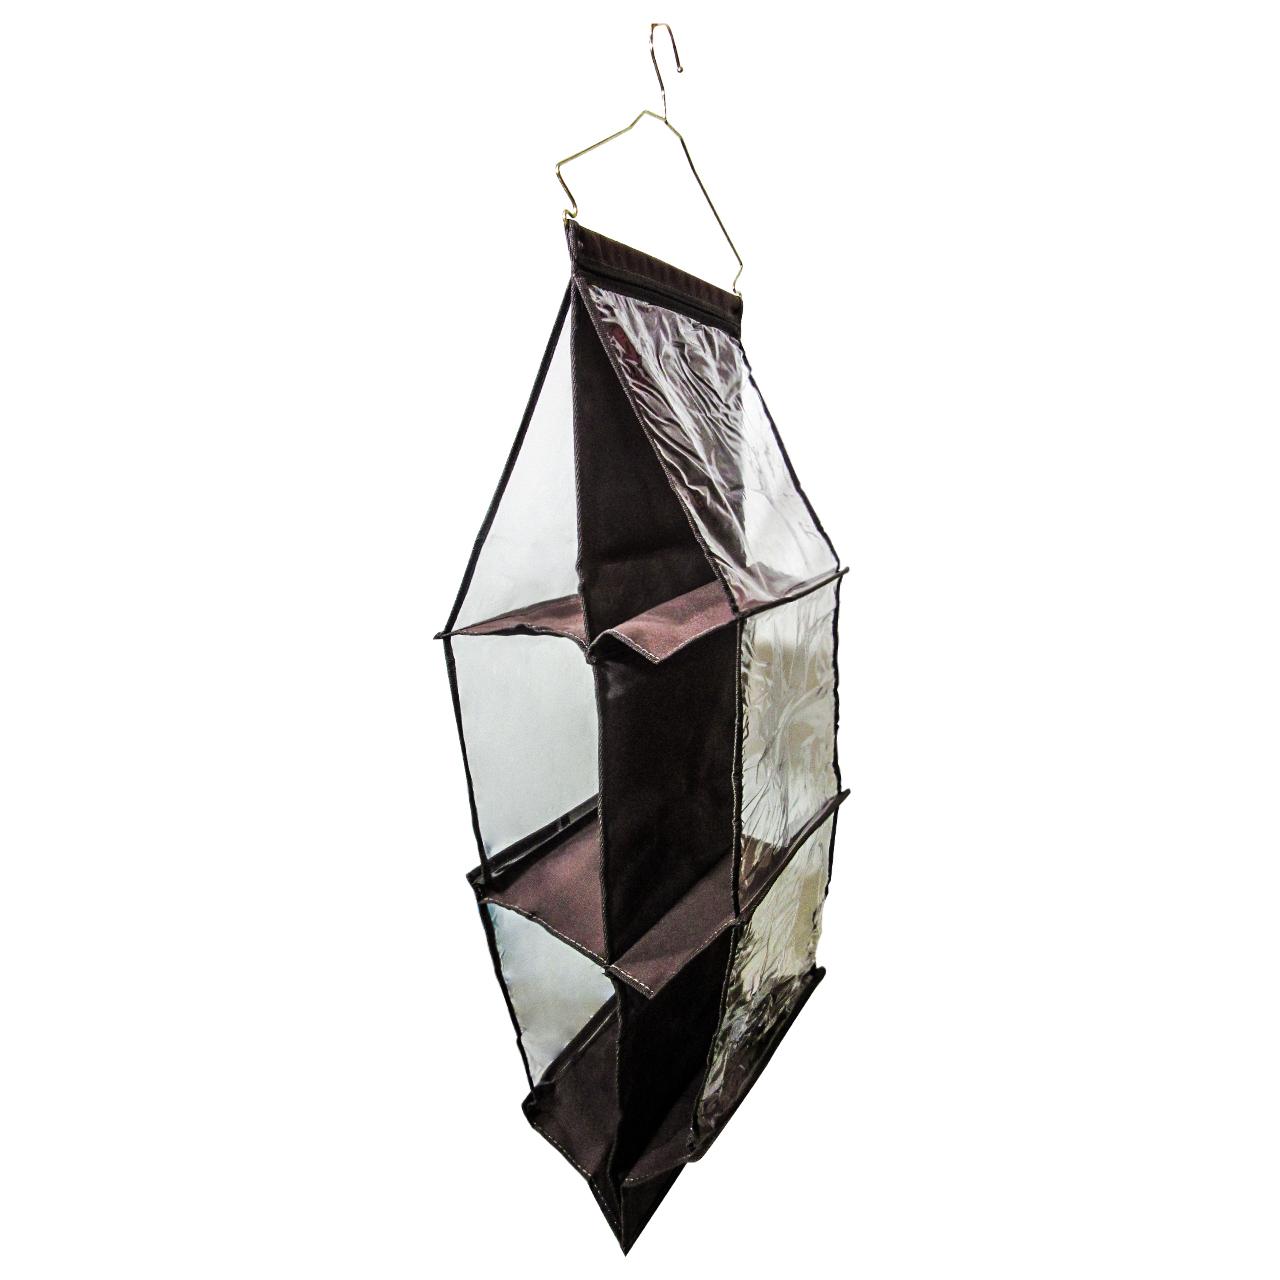 آویز کمد ایران کارا مدل Glass B04